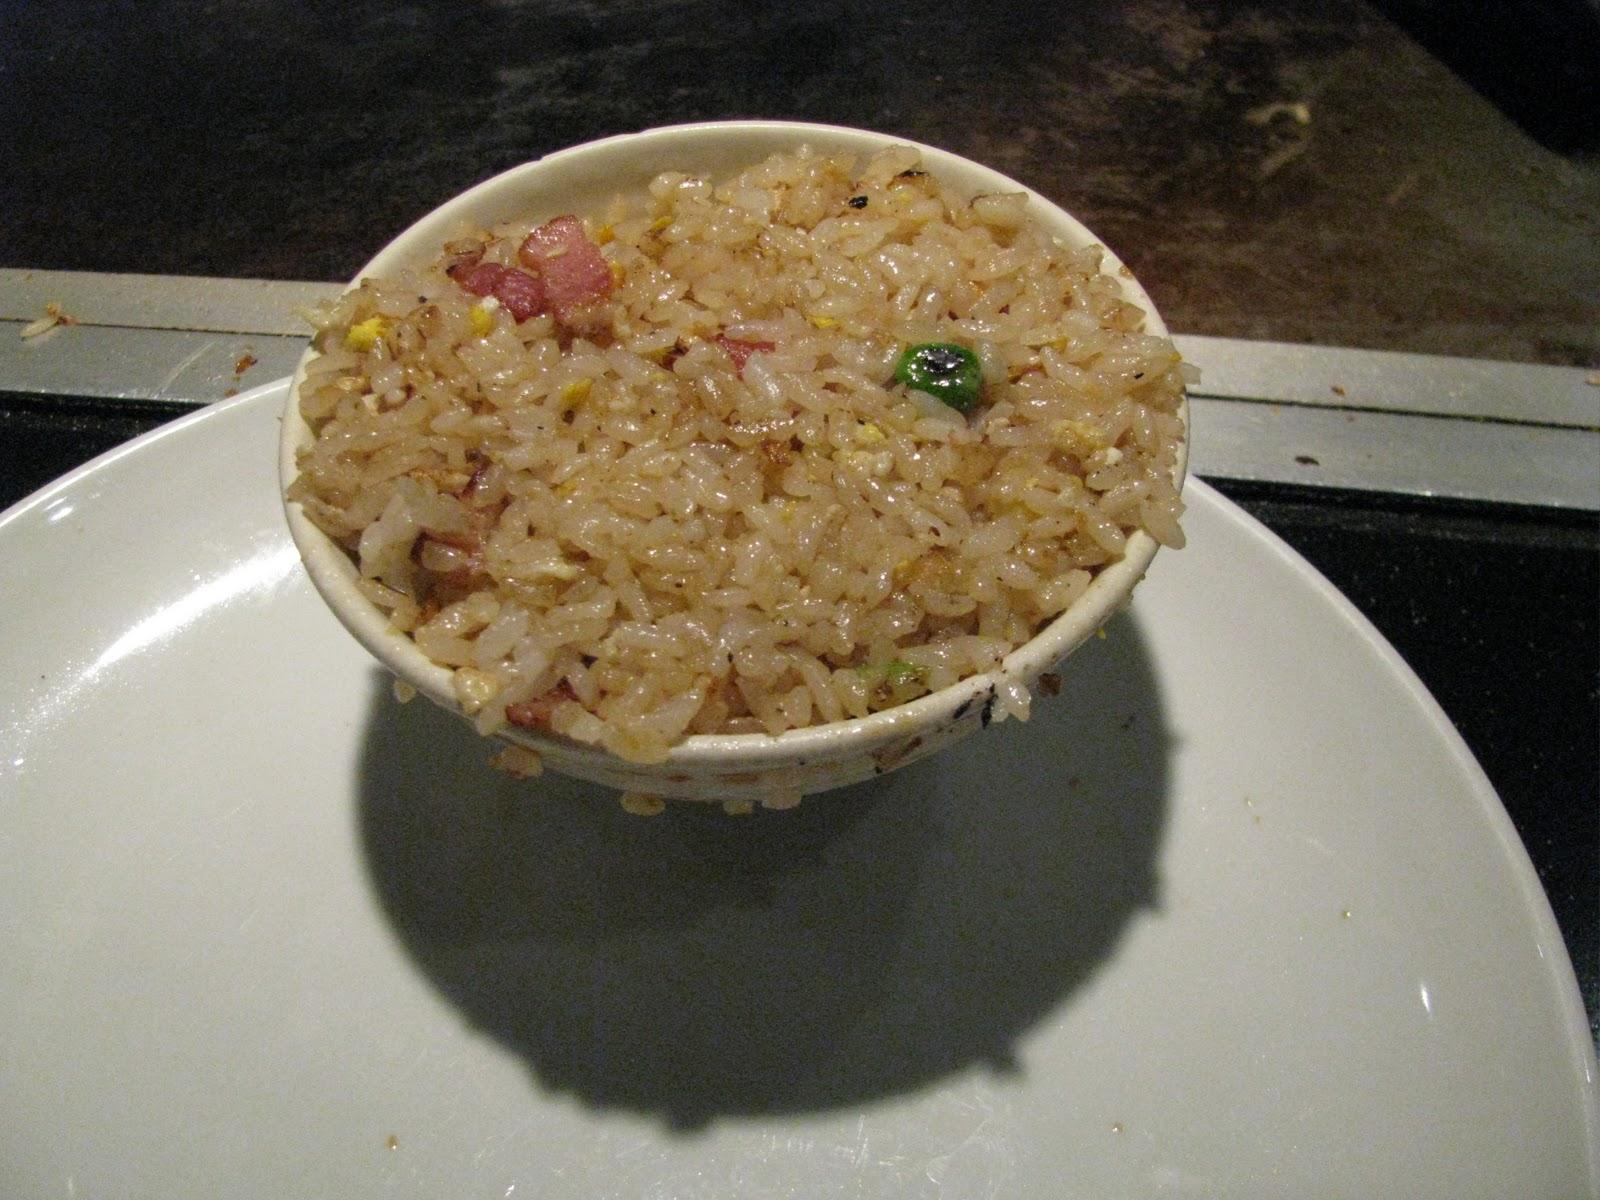 Corrie food teppanyaki at sakura chaya fresno ca fried rice is always good at teppan yaki places ccuart Gallery